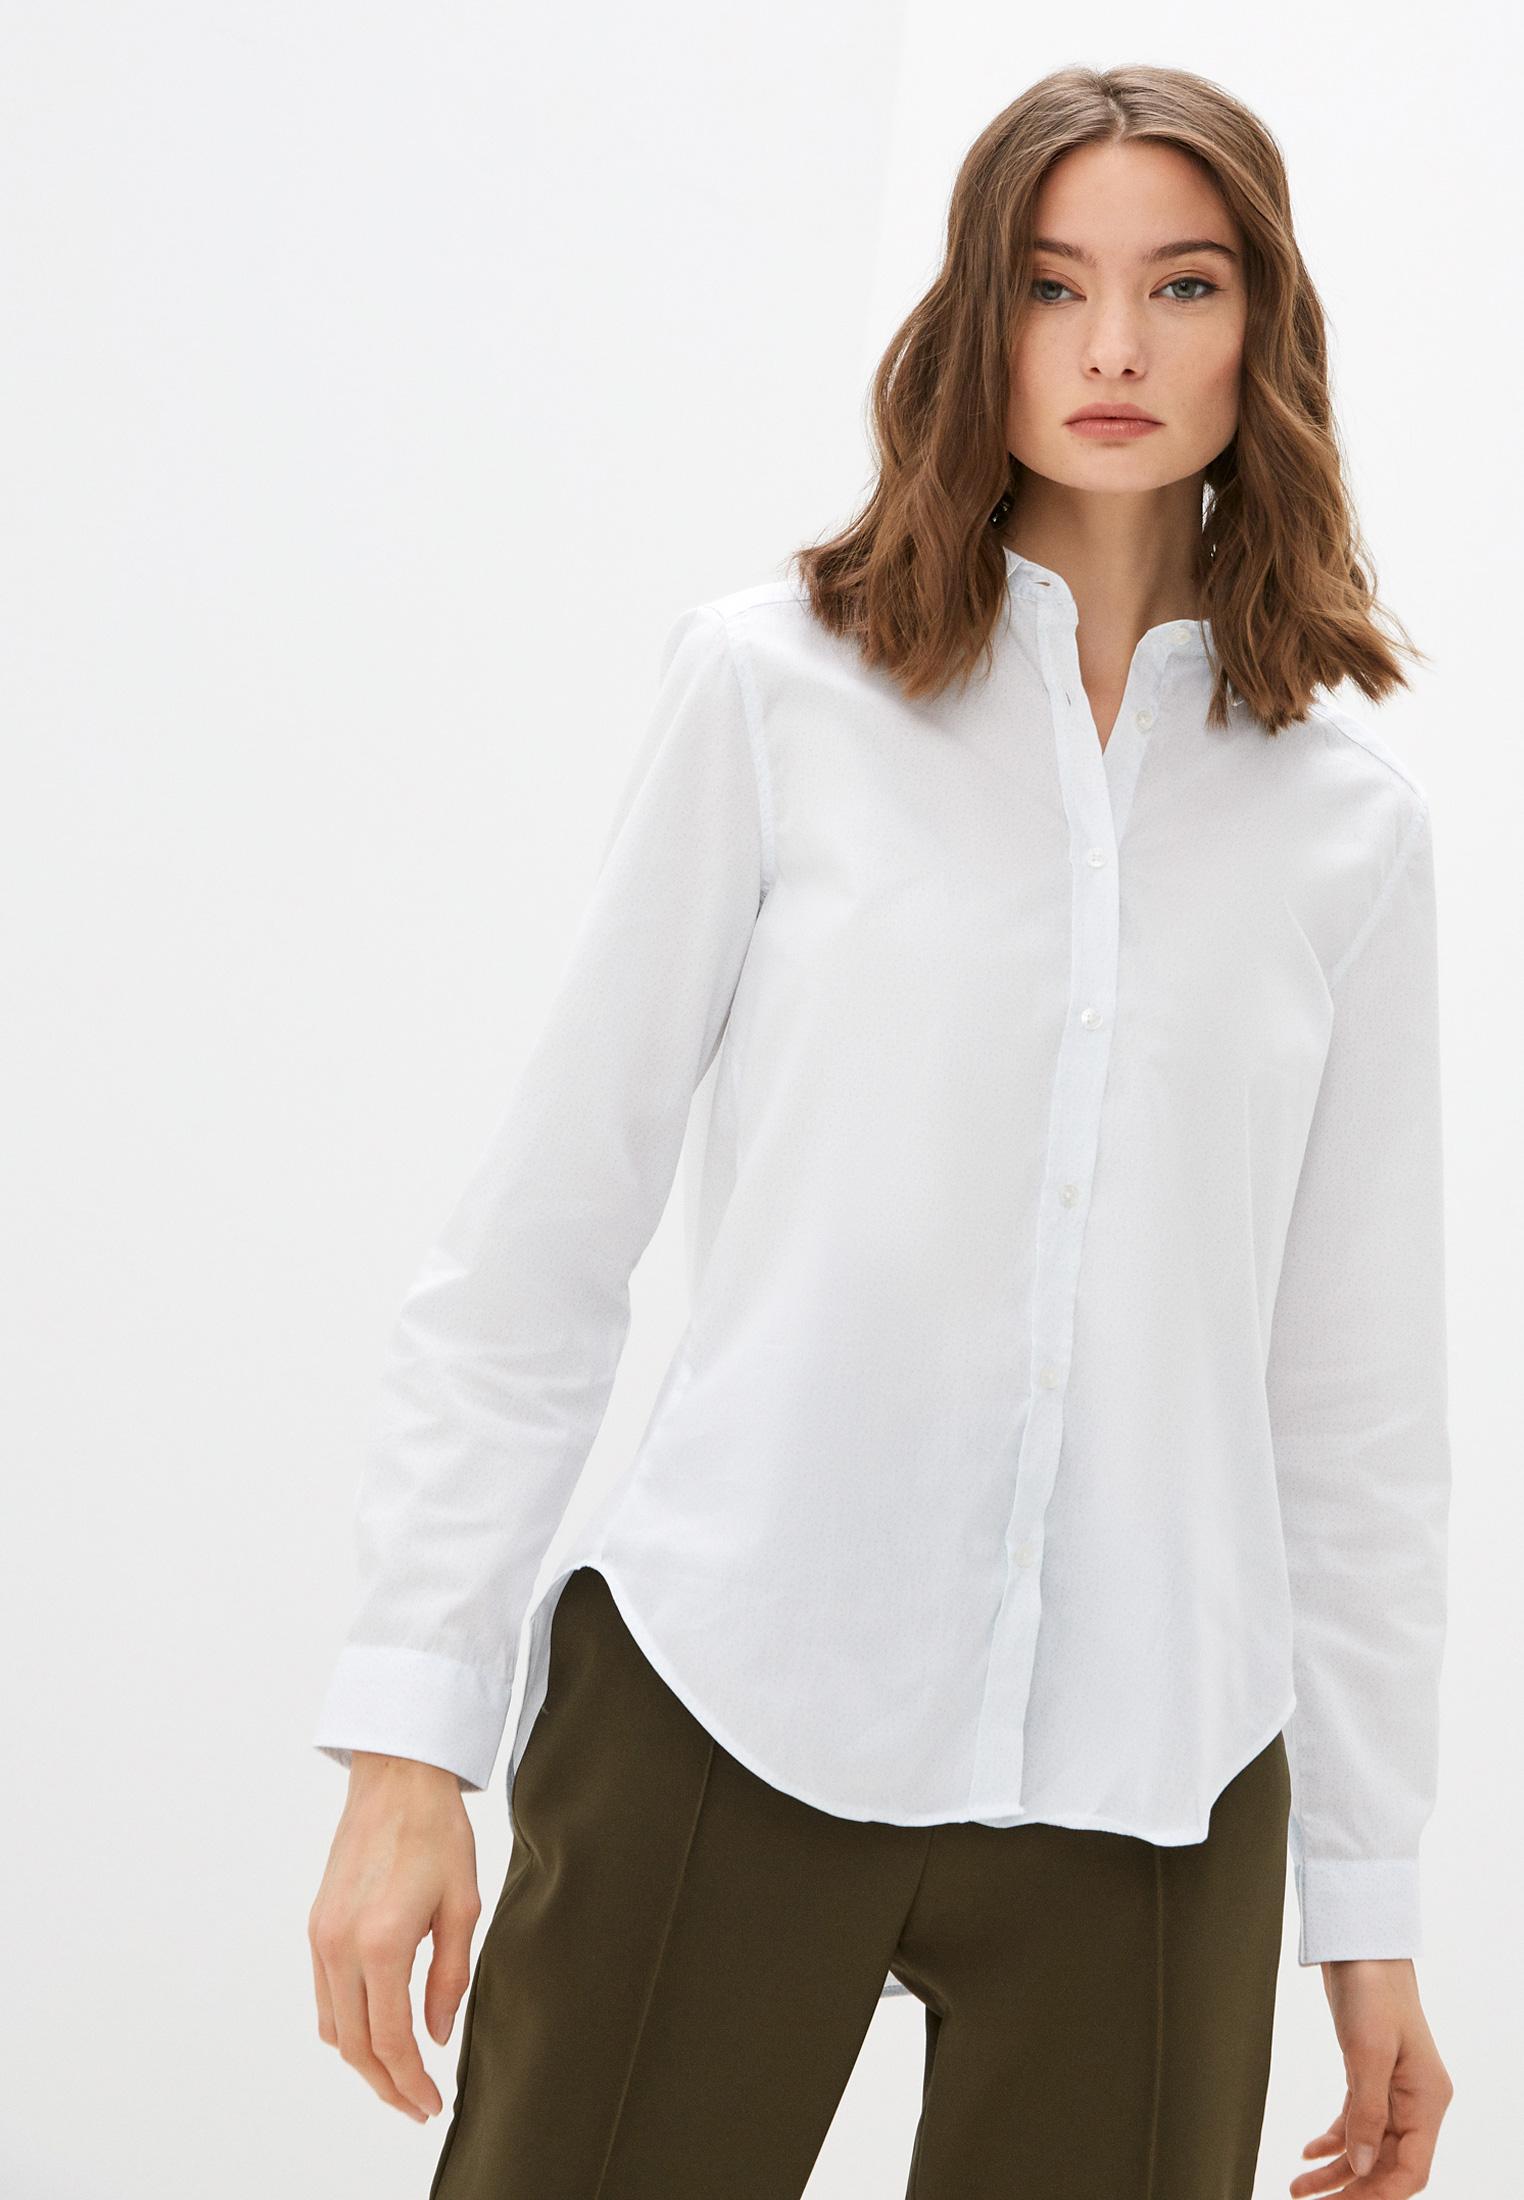 Женские рубашки с длинным рукавом Basics & More Рубашка Basics & More